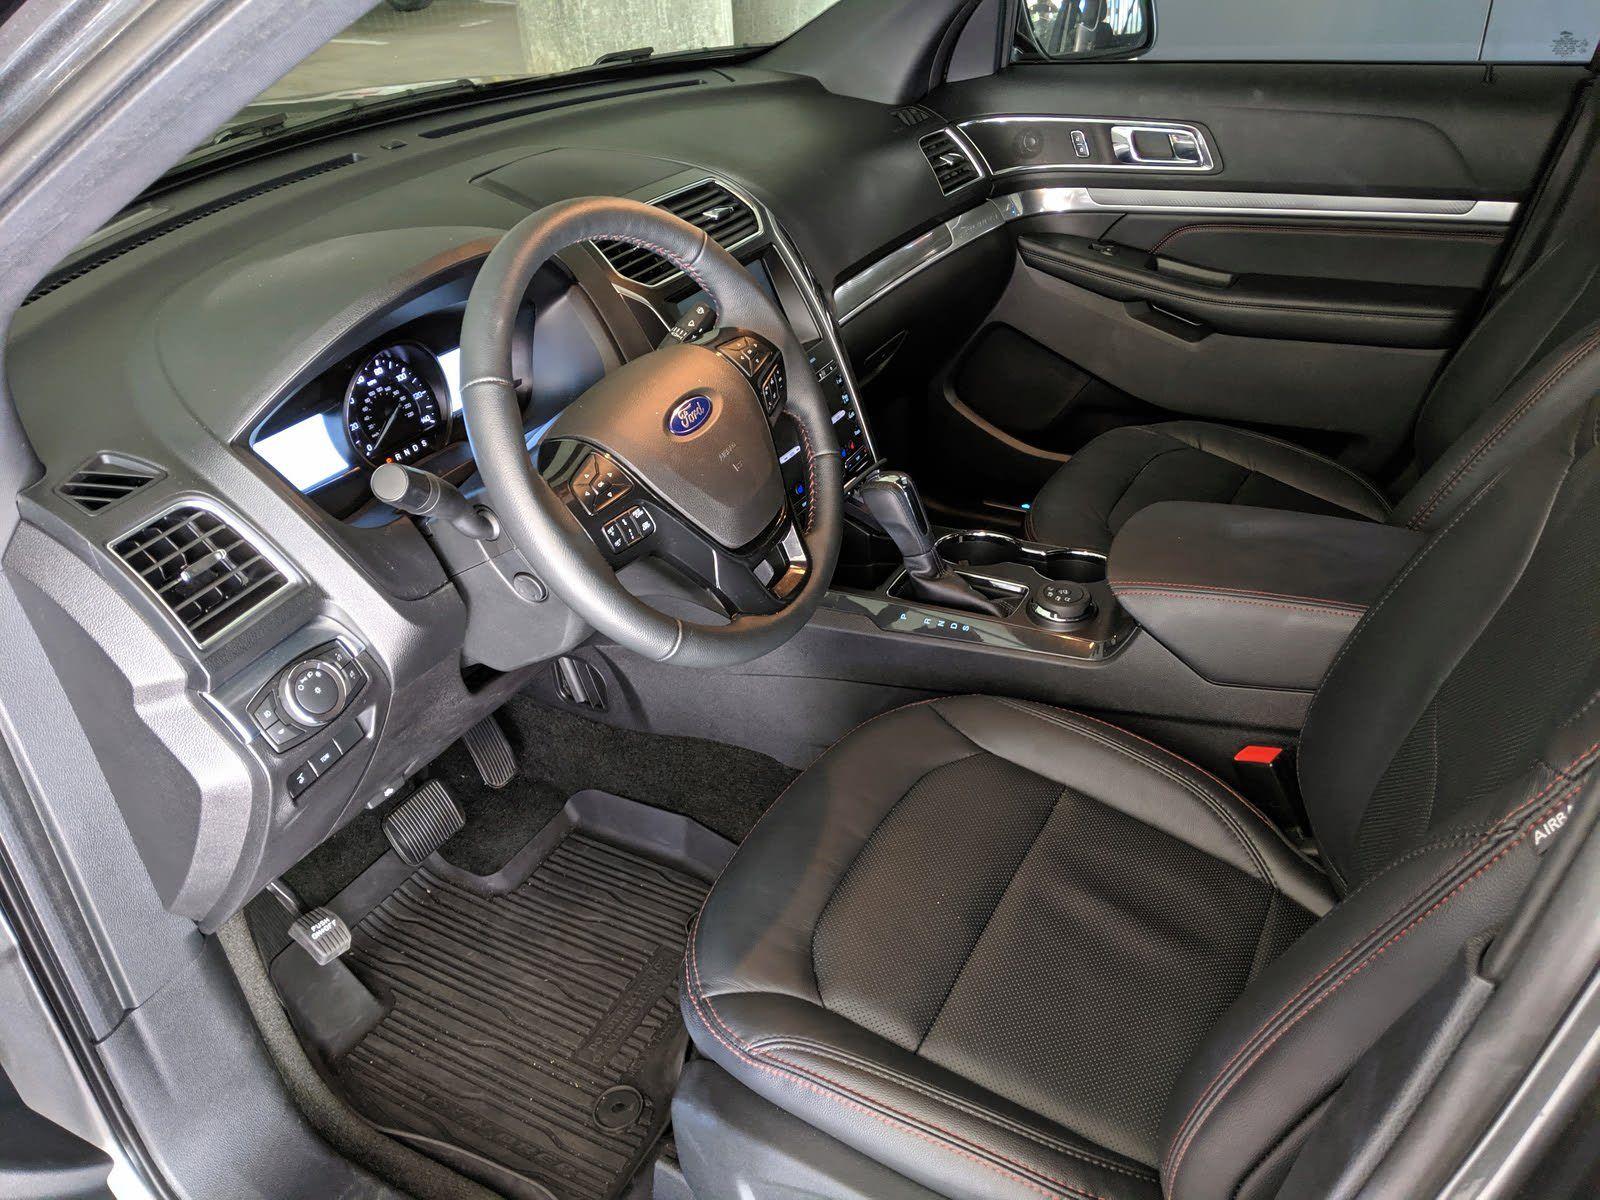 2018 Ford Explorer Sport AWD in 2020 Subaru brz, Subaru